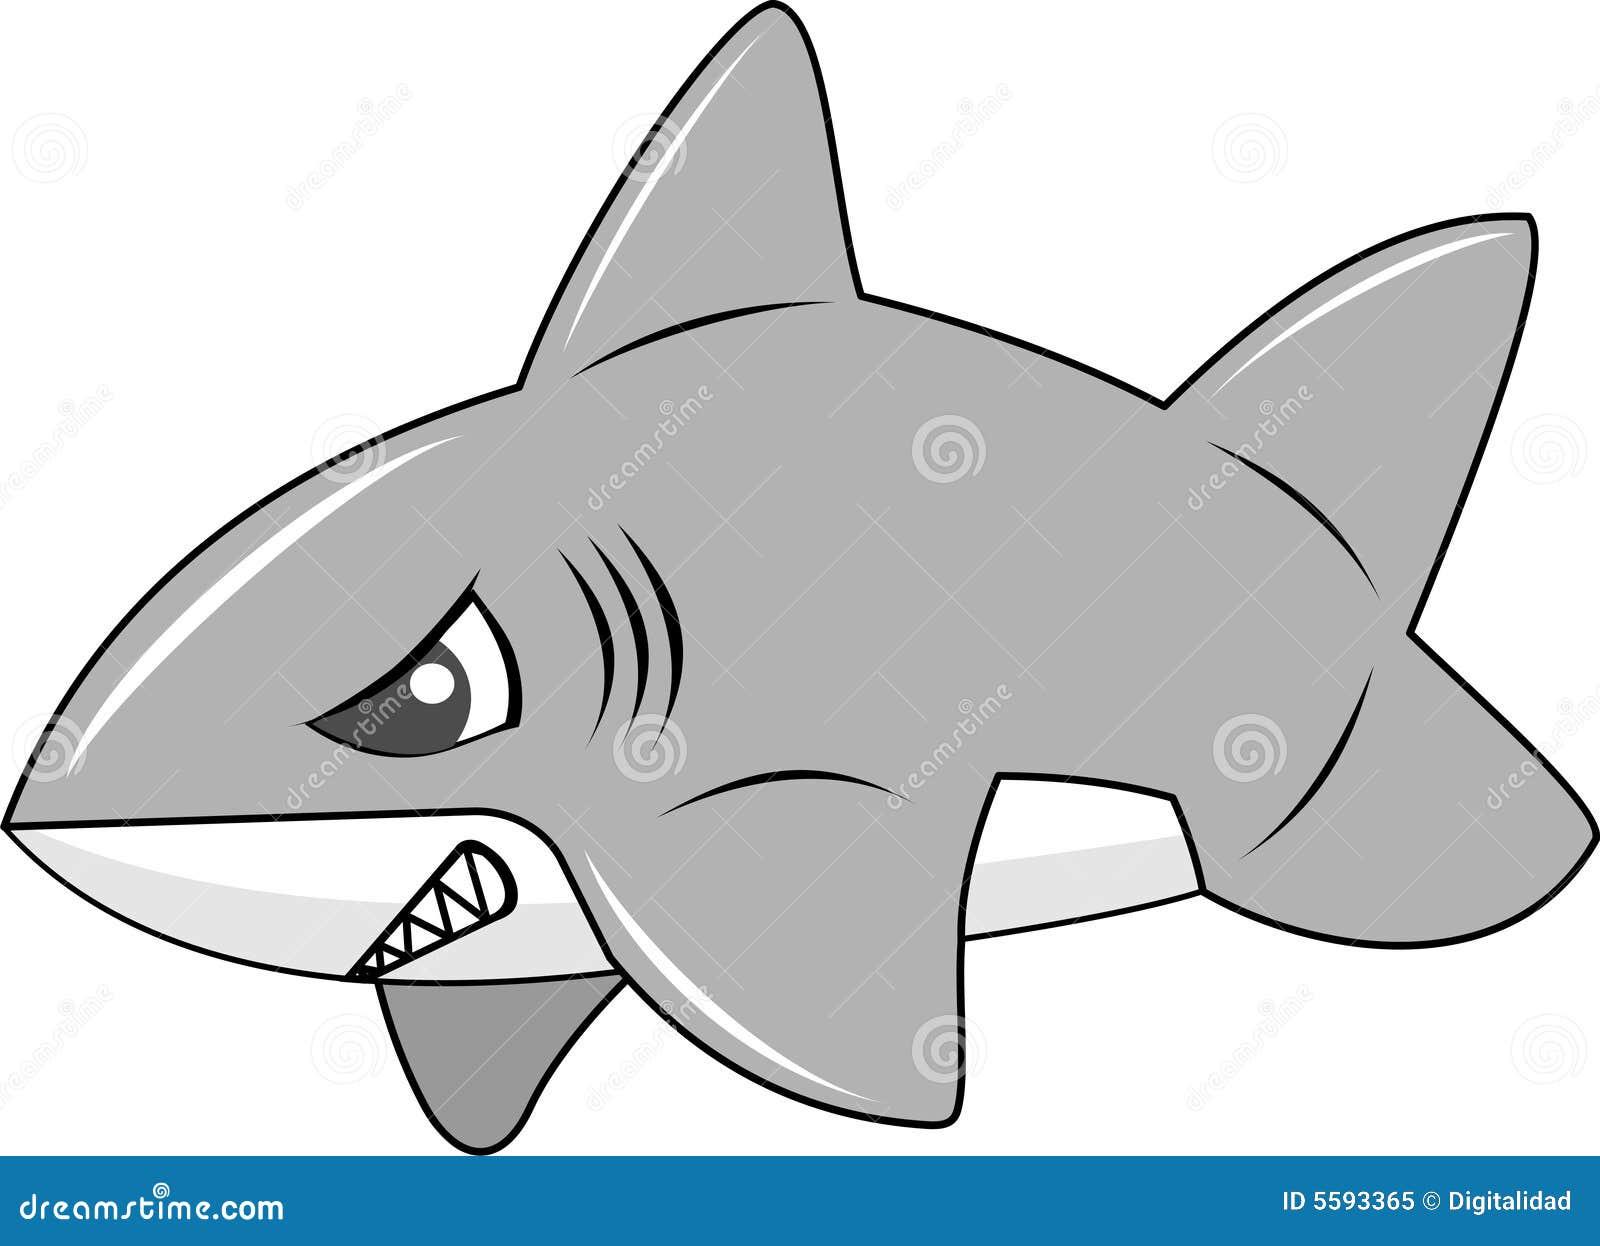 Cute shark clipart black and white - photo#16